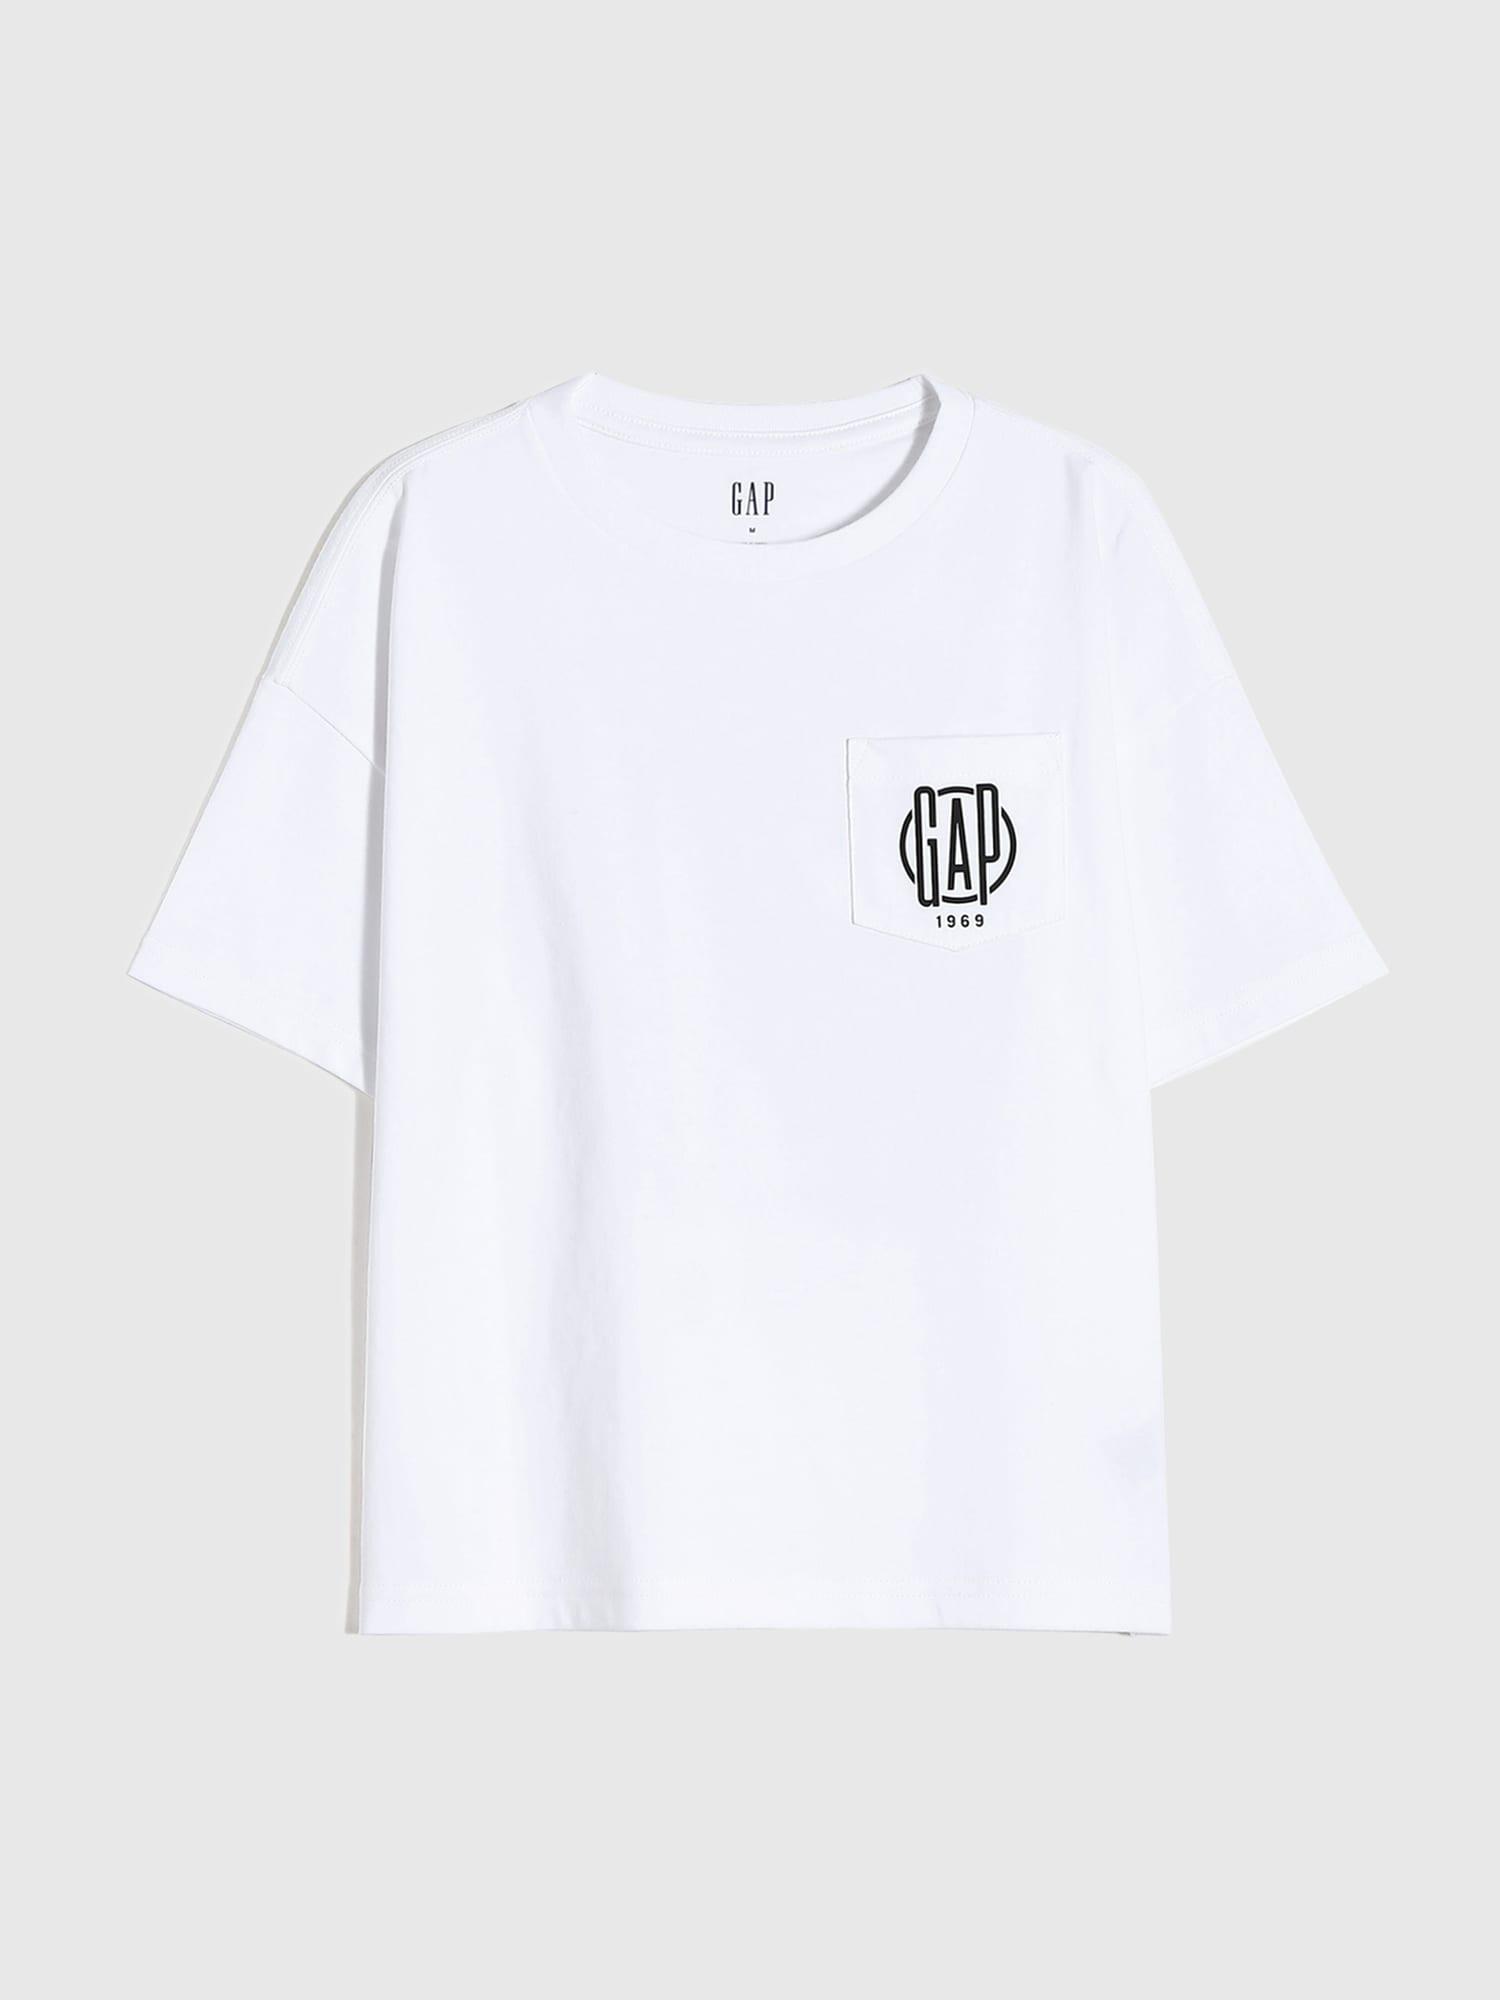 Gapロゴtシャツ